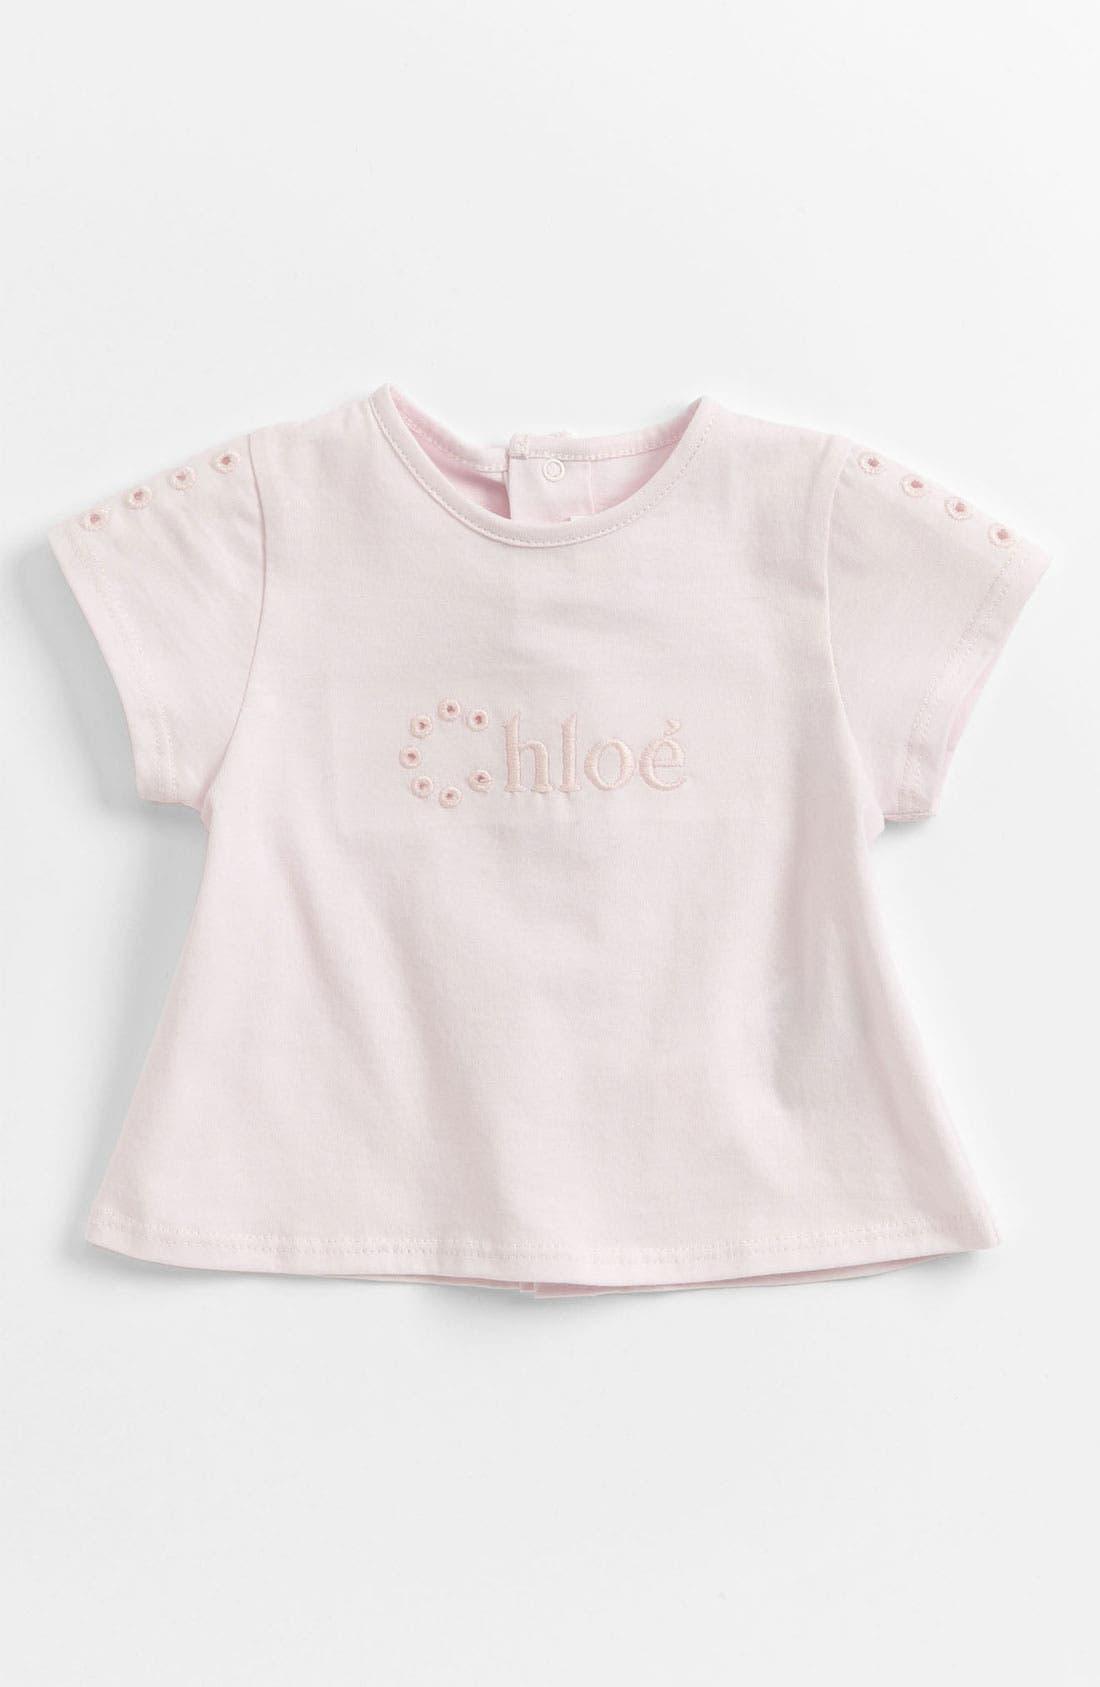 Main Image - Chloé Eyelet Logo Tee (Baby)